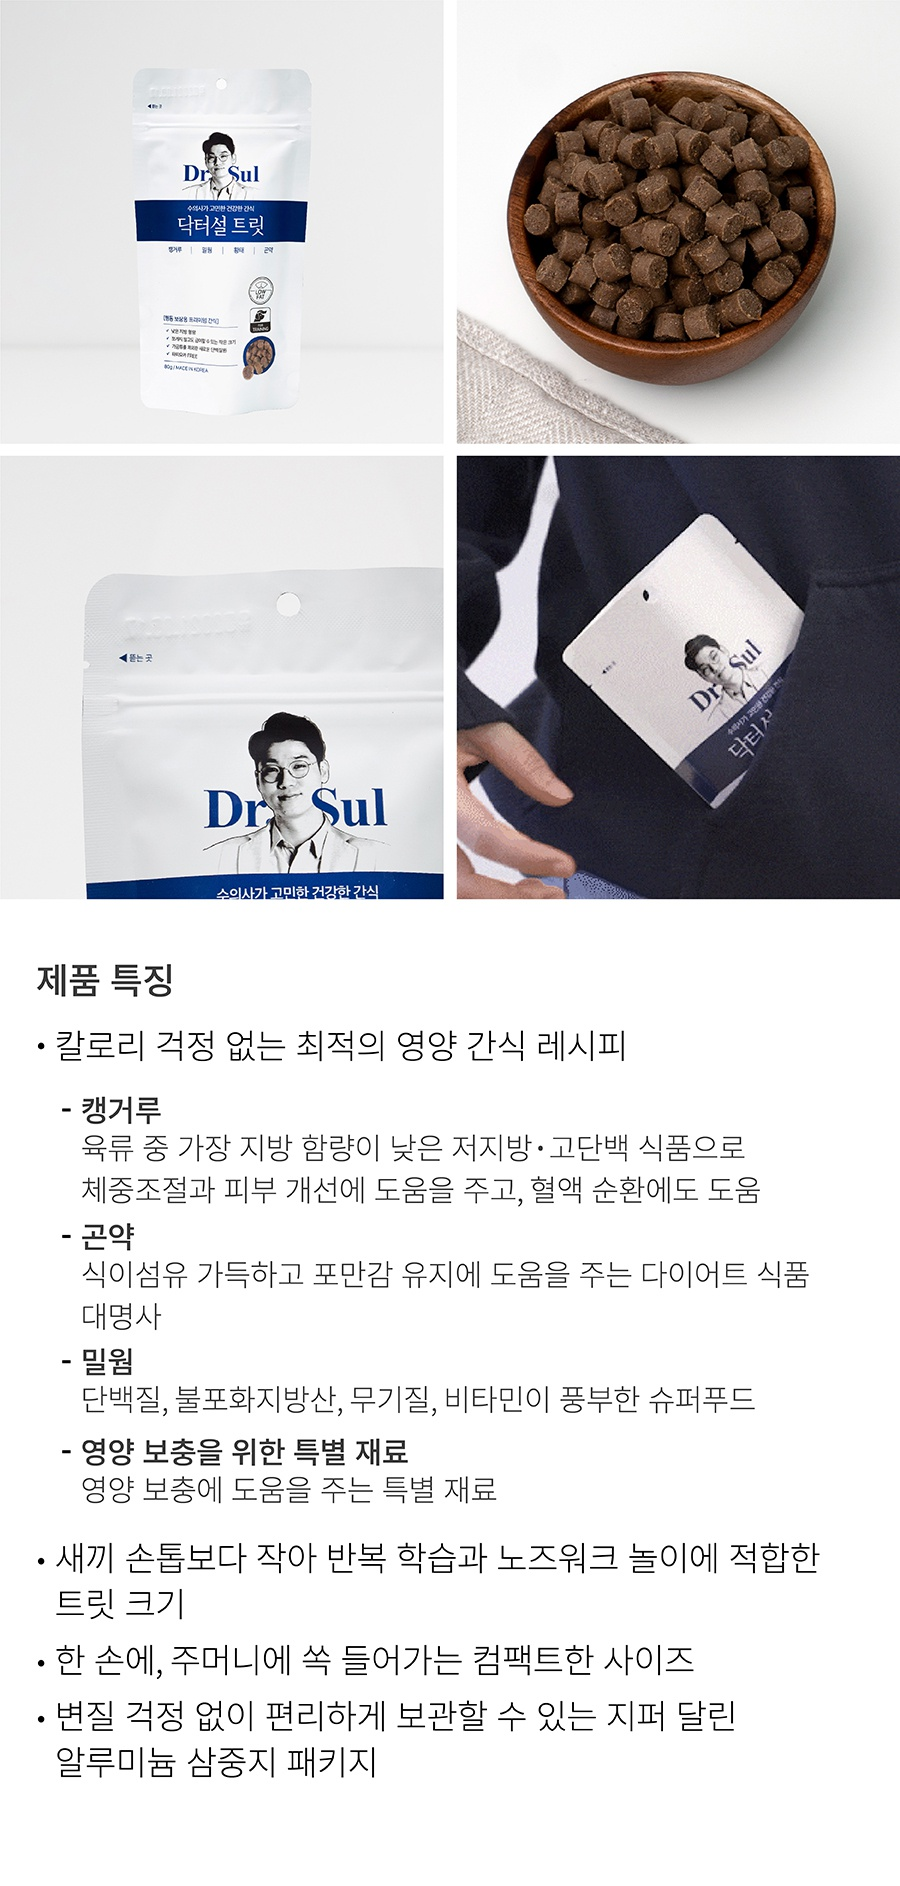 [EVENT] 닥터설 트릿-상품이미지-8